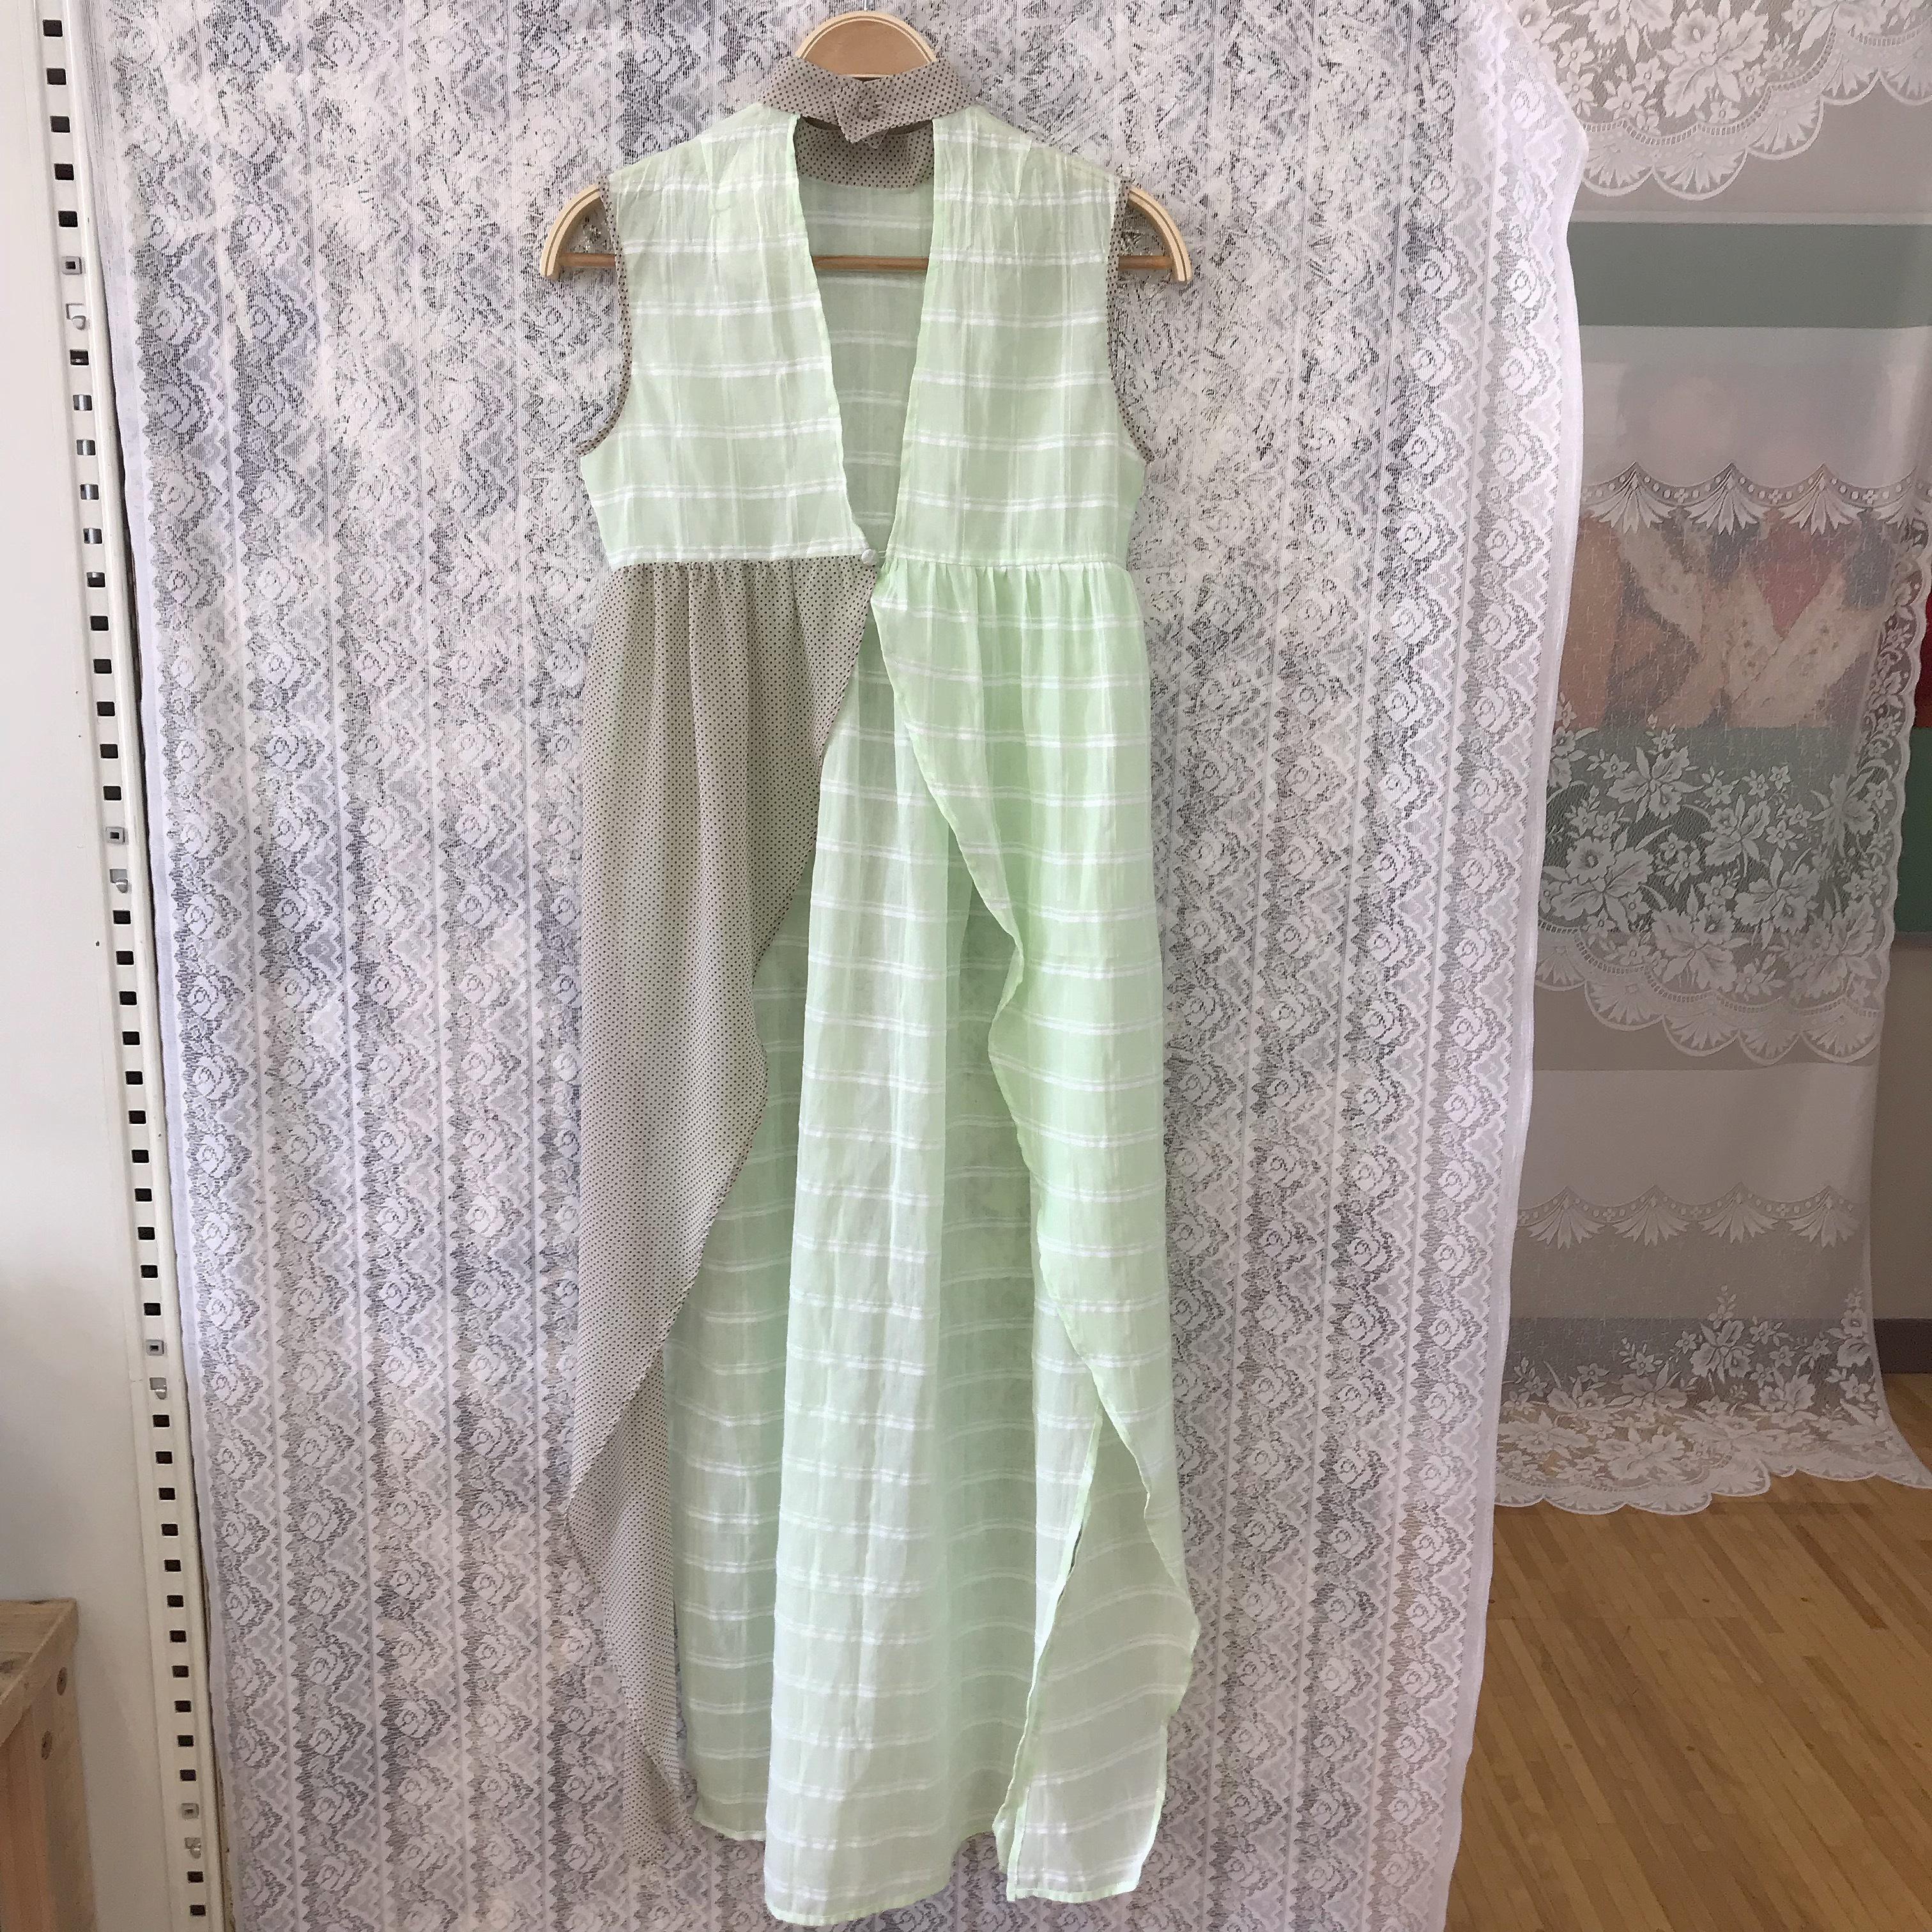 Apron dress〈green×beige〉